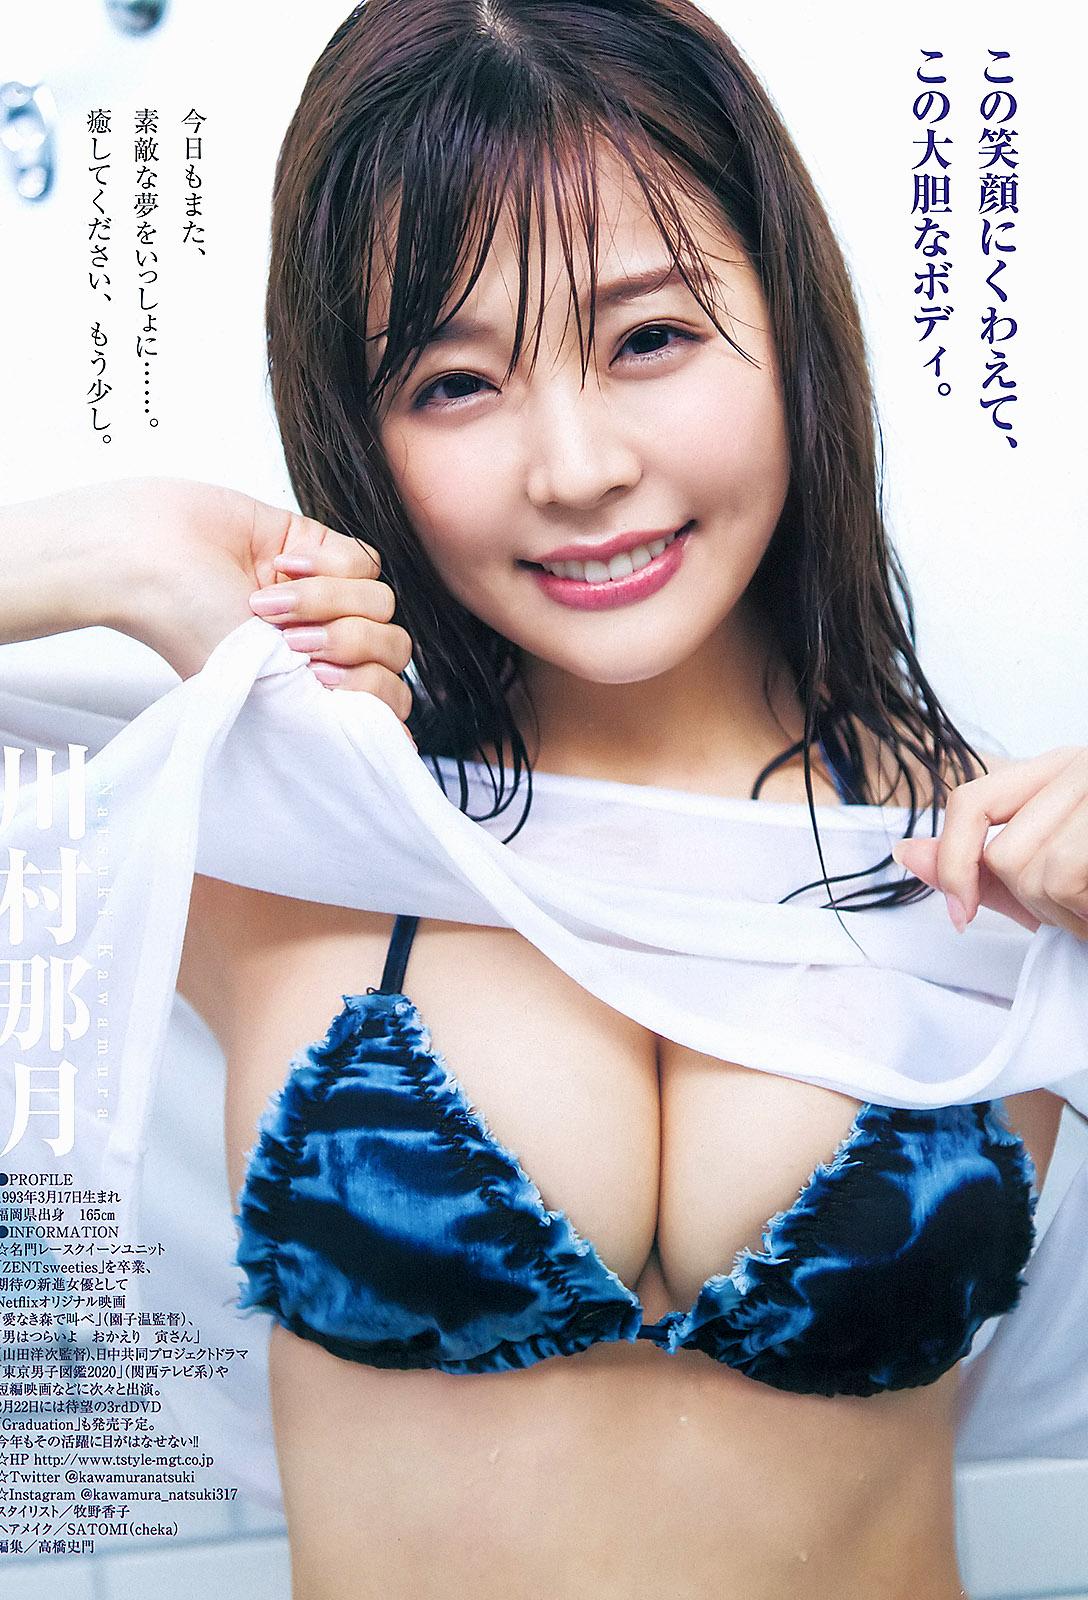 Natsuki Kawamura Young Jump 200206 04.jpg